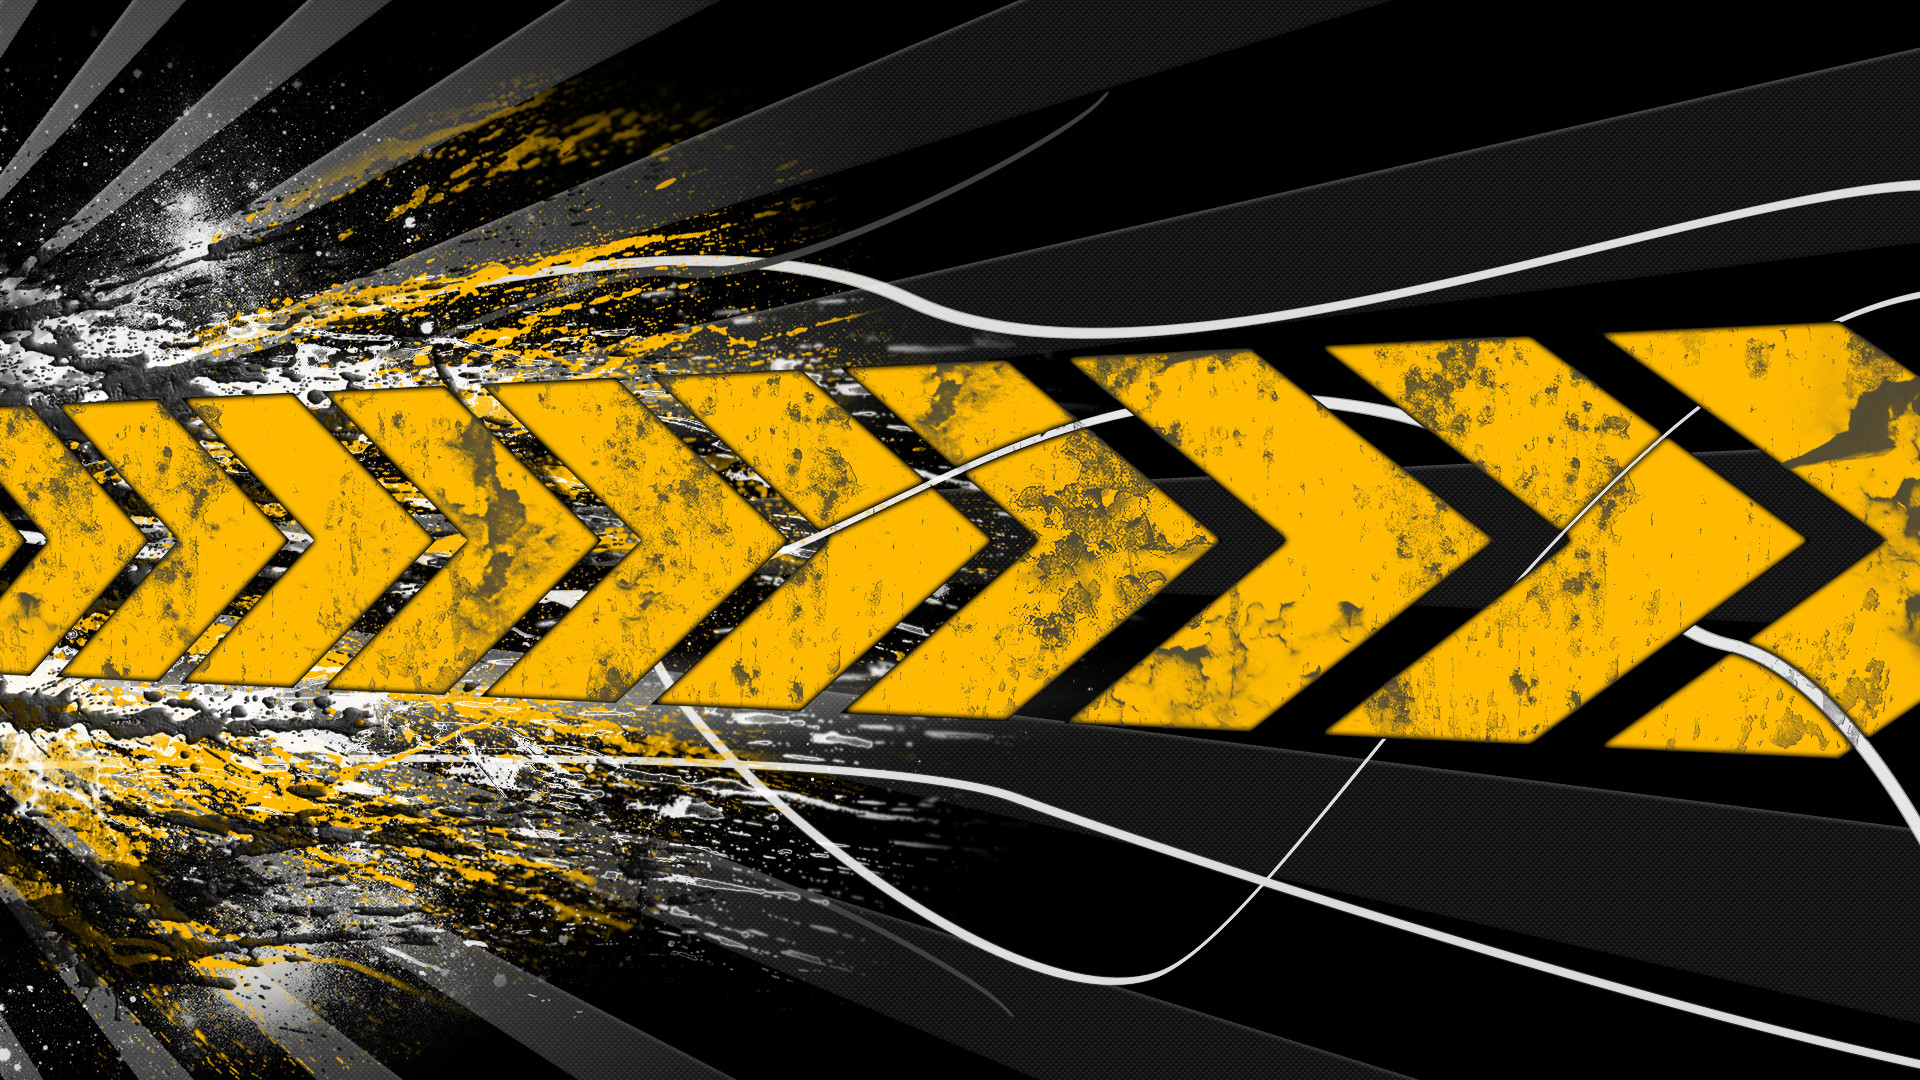 Yellow Abstract Hd